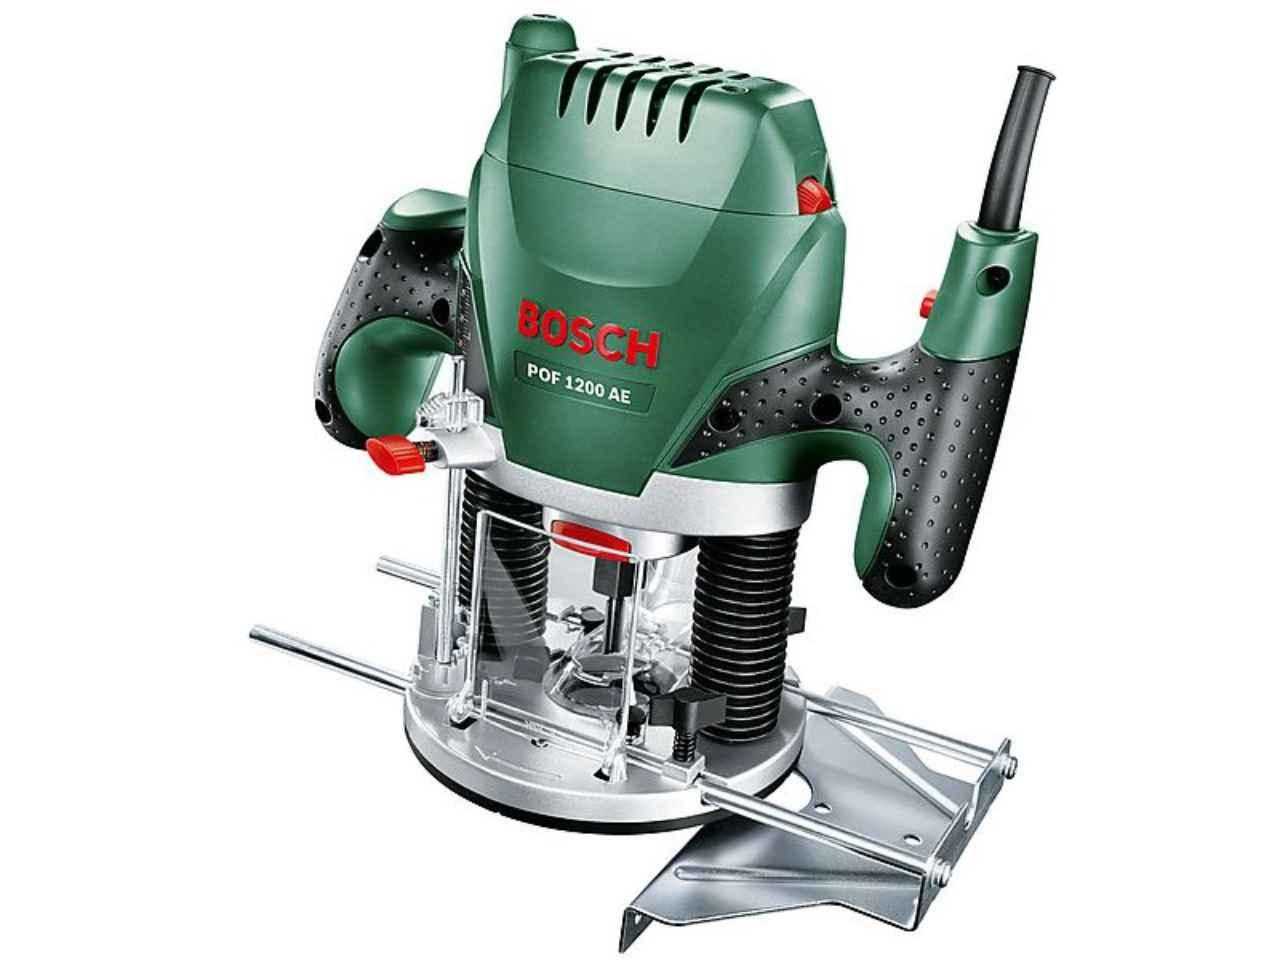 bosch green pof 1200 ae 230v 1200w défonceuse | ebay